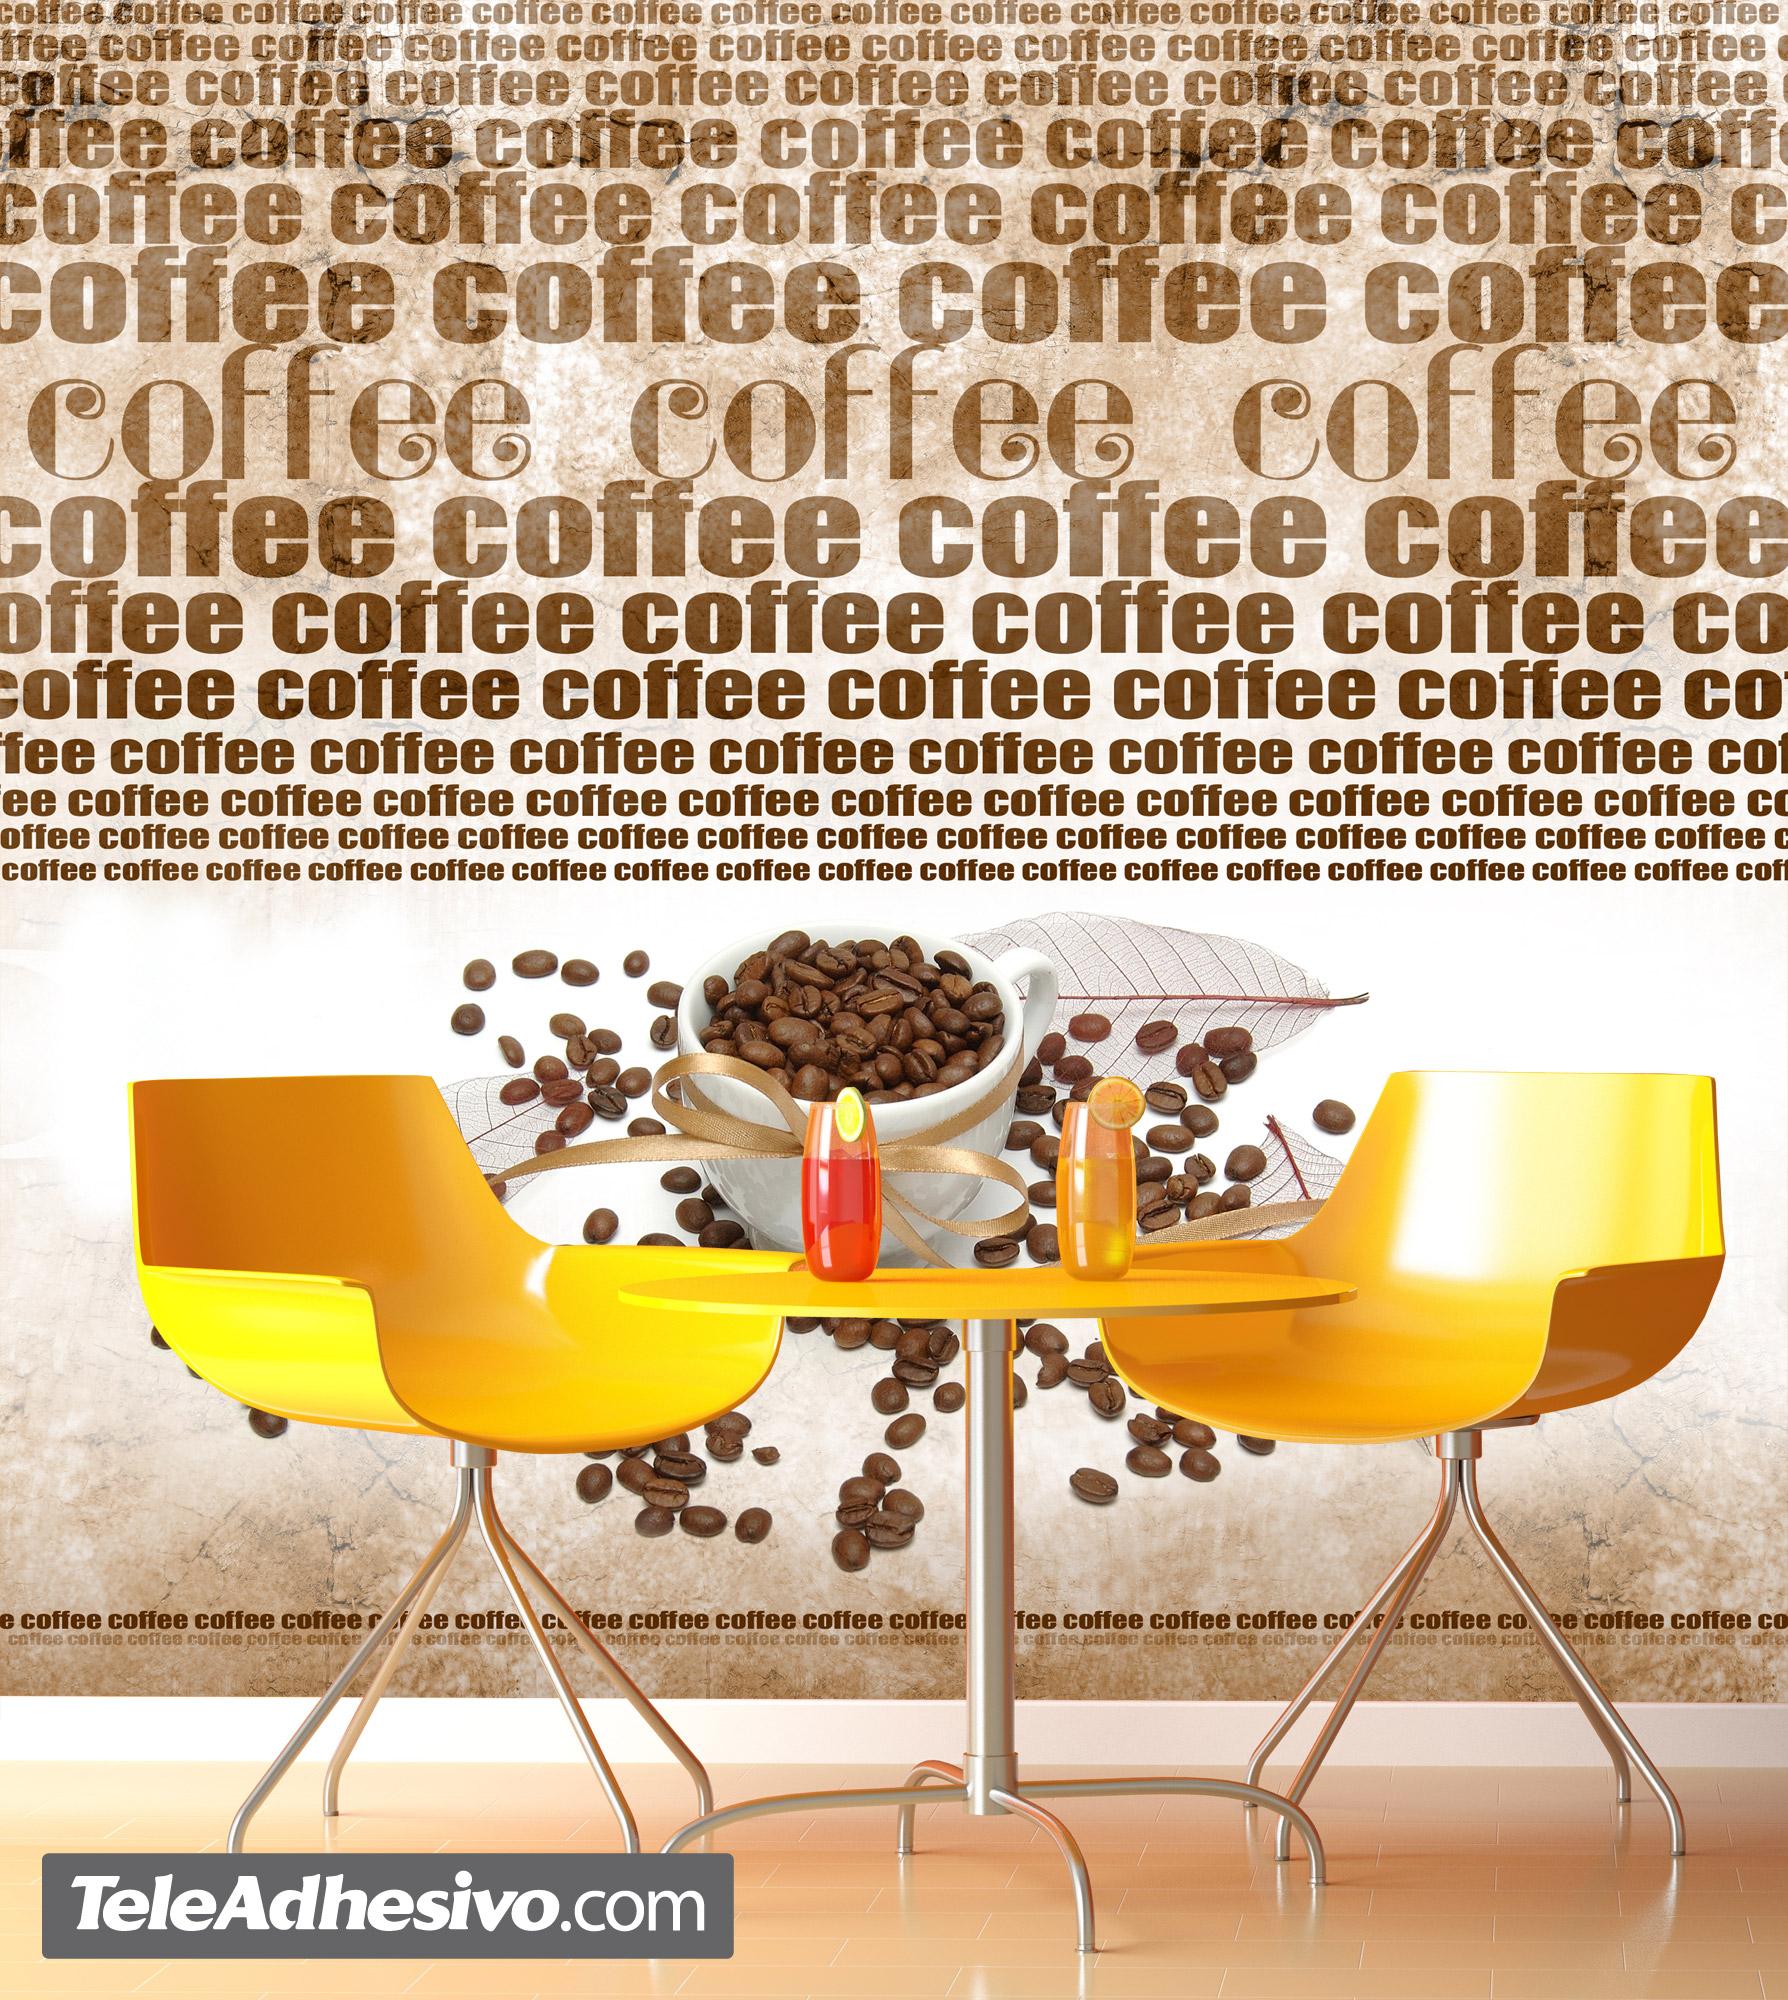 Fototapeten: café